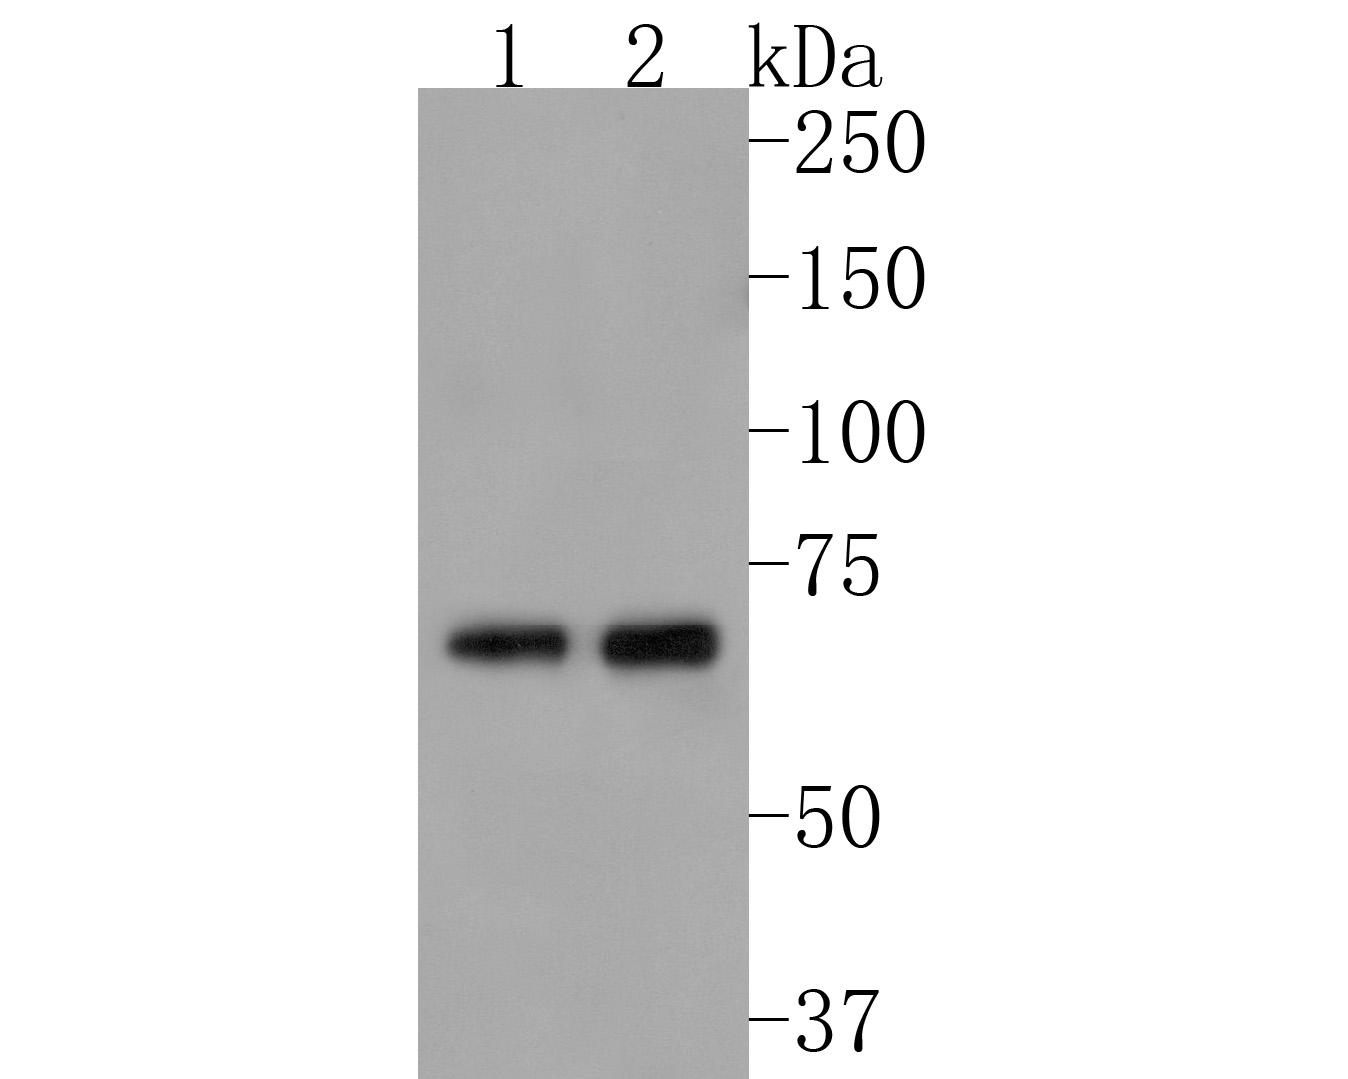 Western blot analysis of Albumin on Hela cells lysates using anti-Albumin antibody at 1/1,000 dilution.